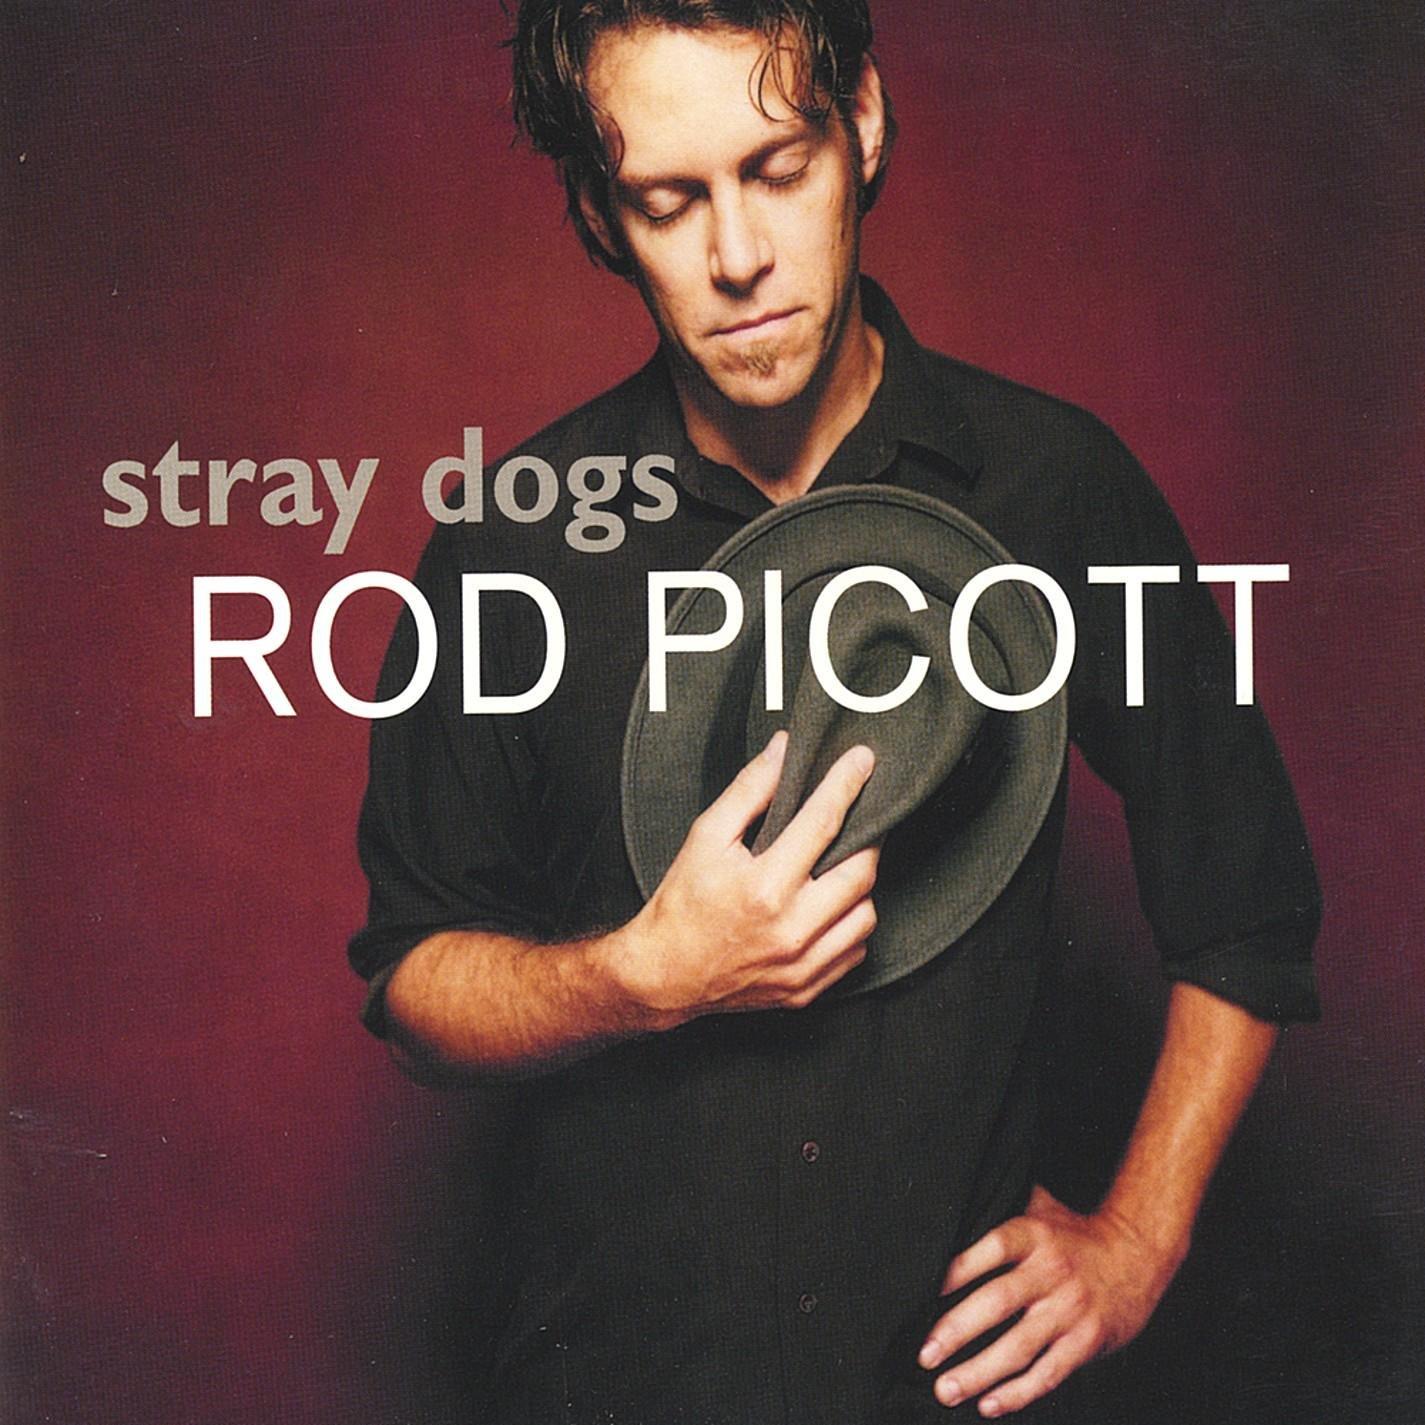 Rod Picott – Stray Dogs (2002) [FLAC]